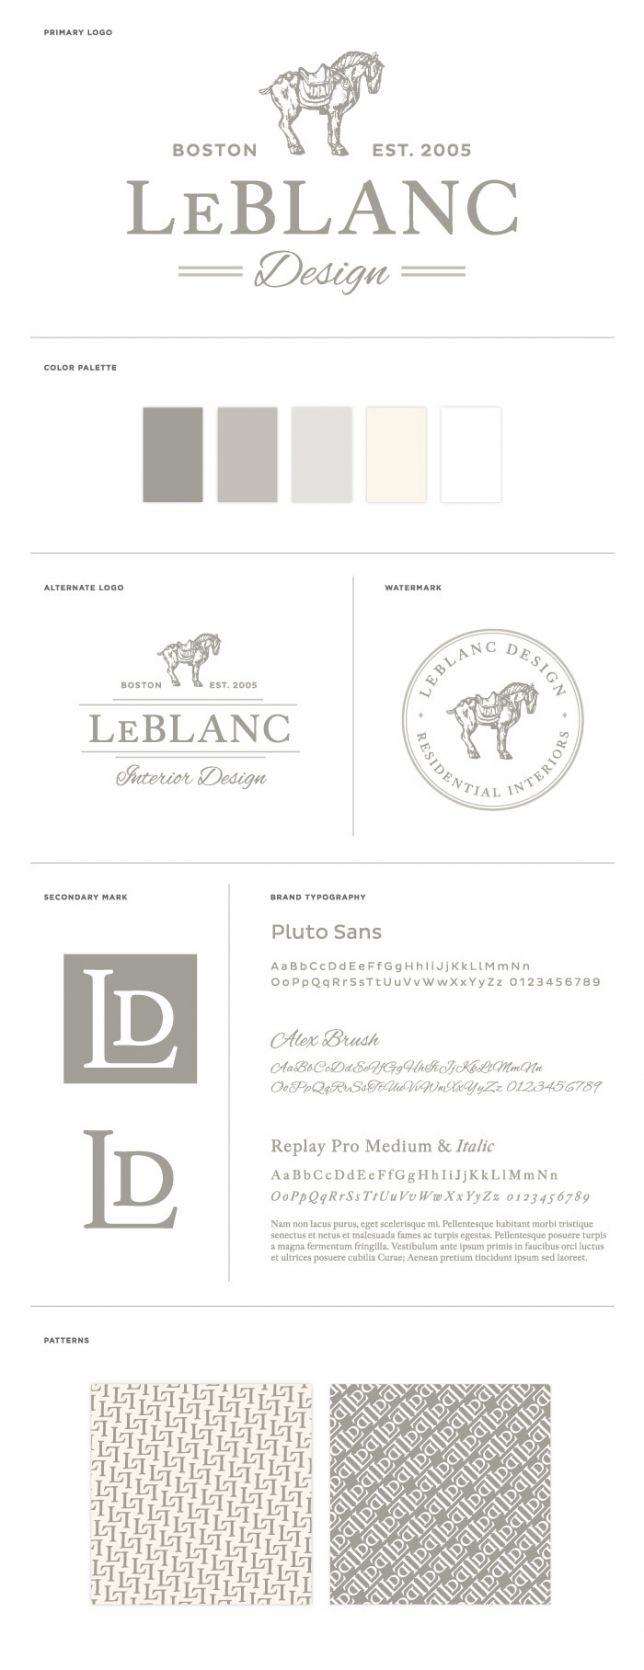 Leblanc Interior Design Branding And Identity Design By Braizen Layout Pinterest Fonts